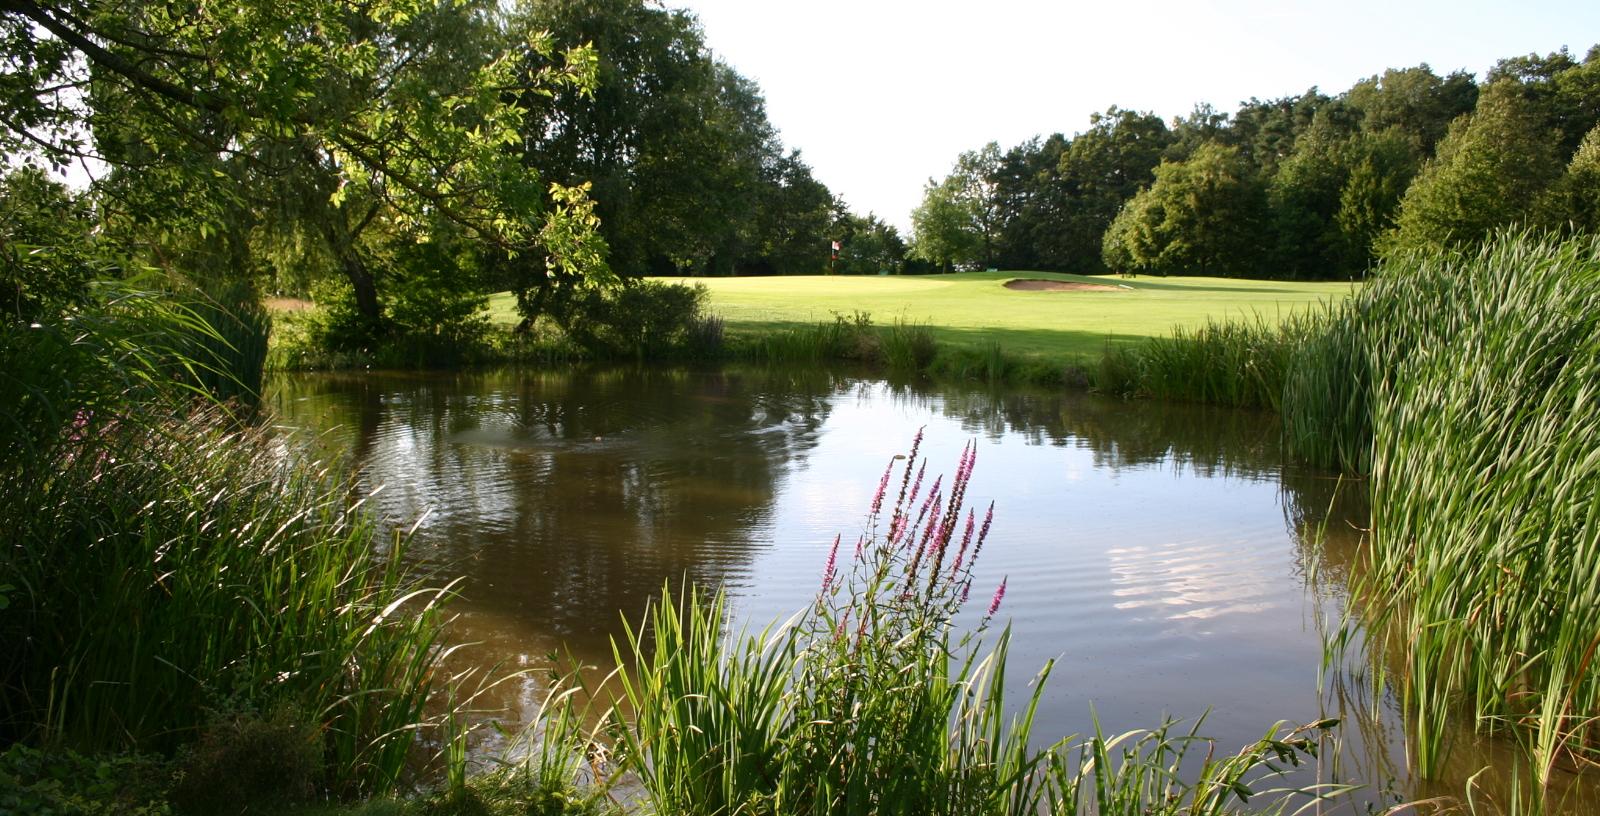 Overview of golf course named Golfanlage Puschendorf